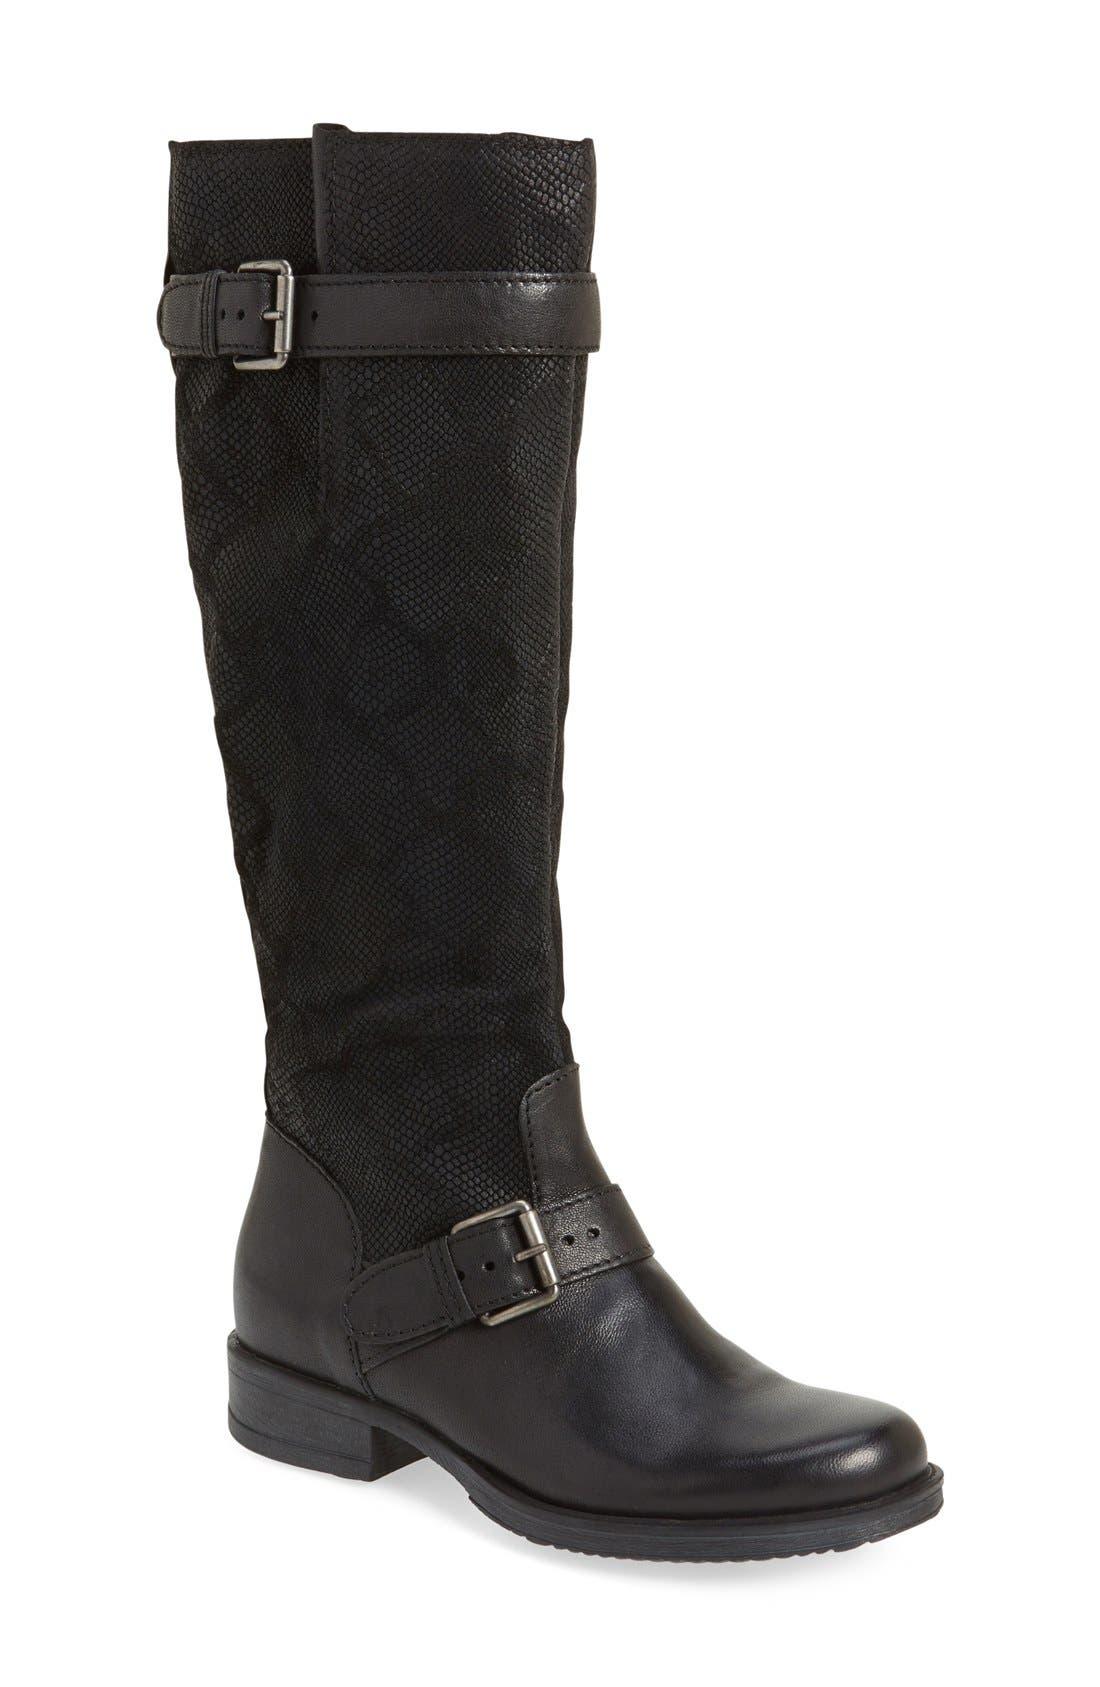 Main Image - MizMooz'Archer' Tall Boot (Women)